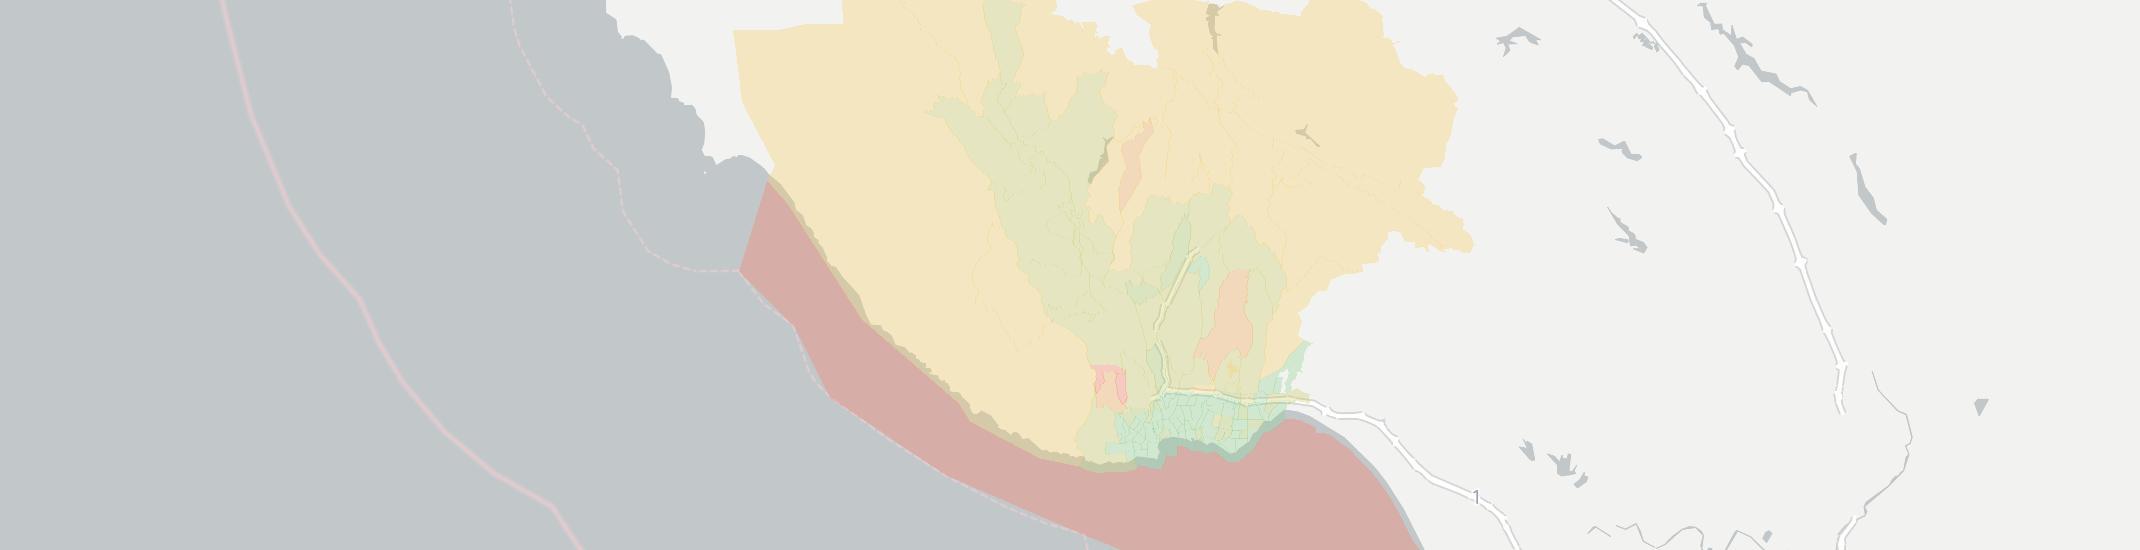 Santa Cruz Internet Competition Map. Click for interactive map.